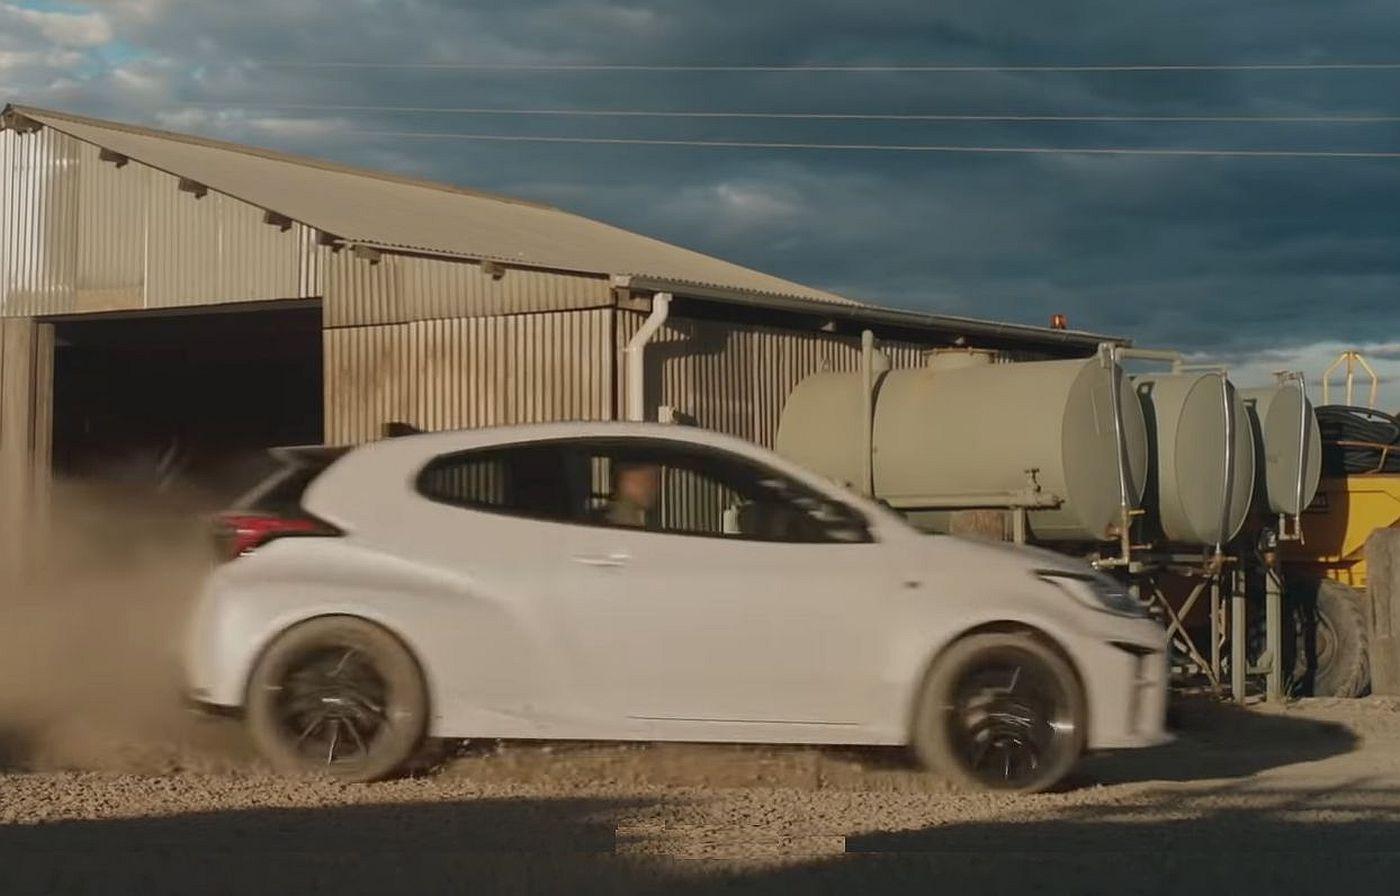 Toyota Yaris GR Australija commercial